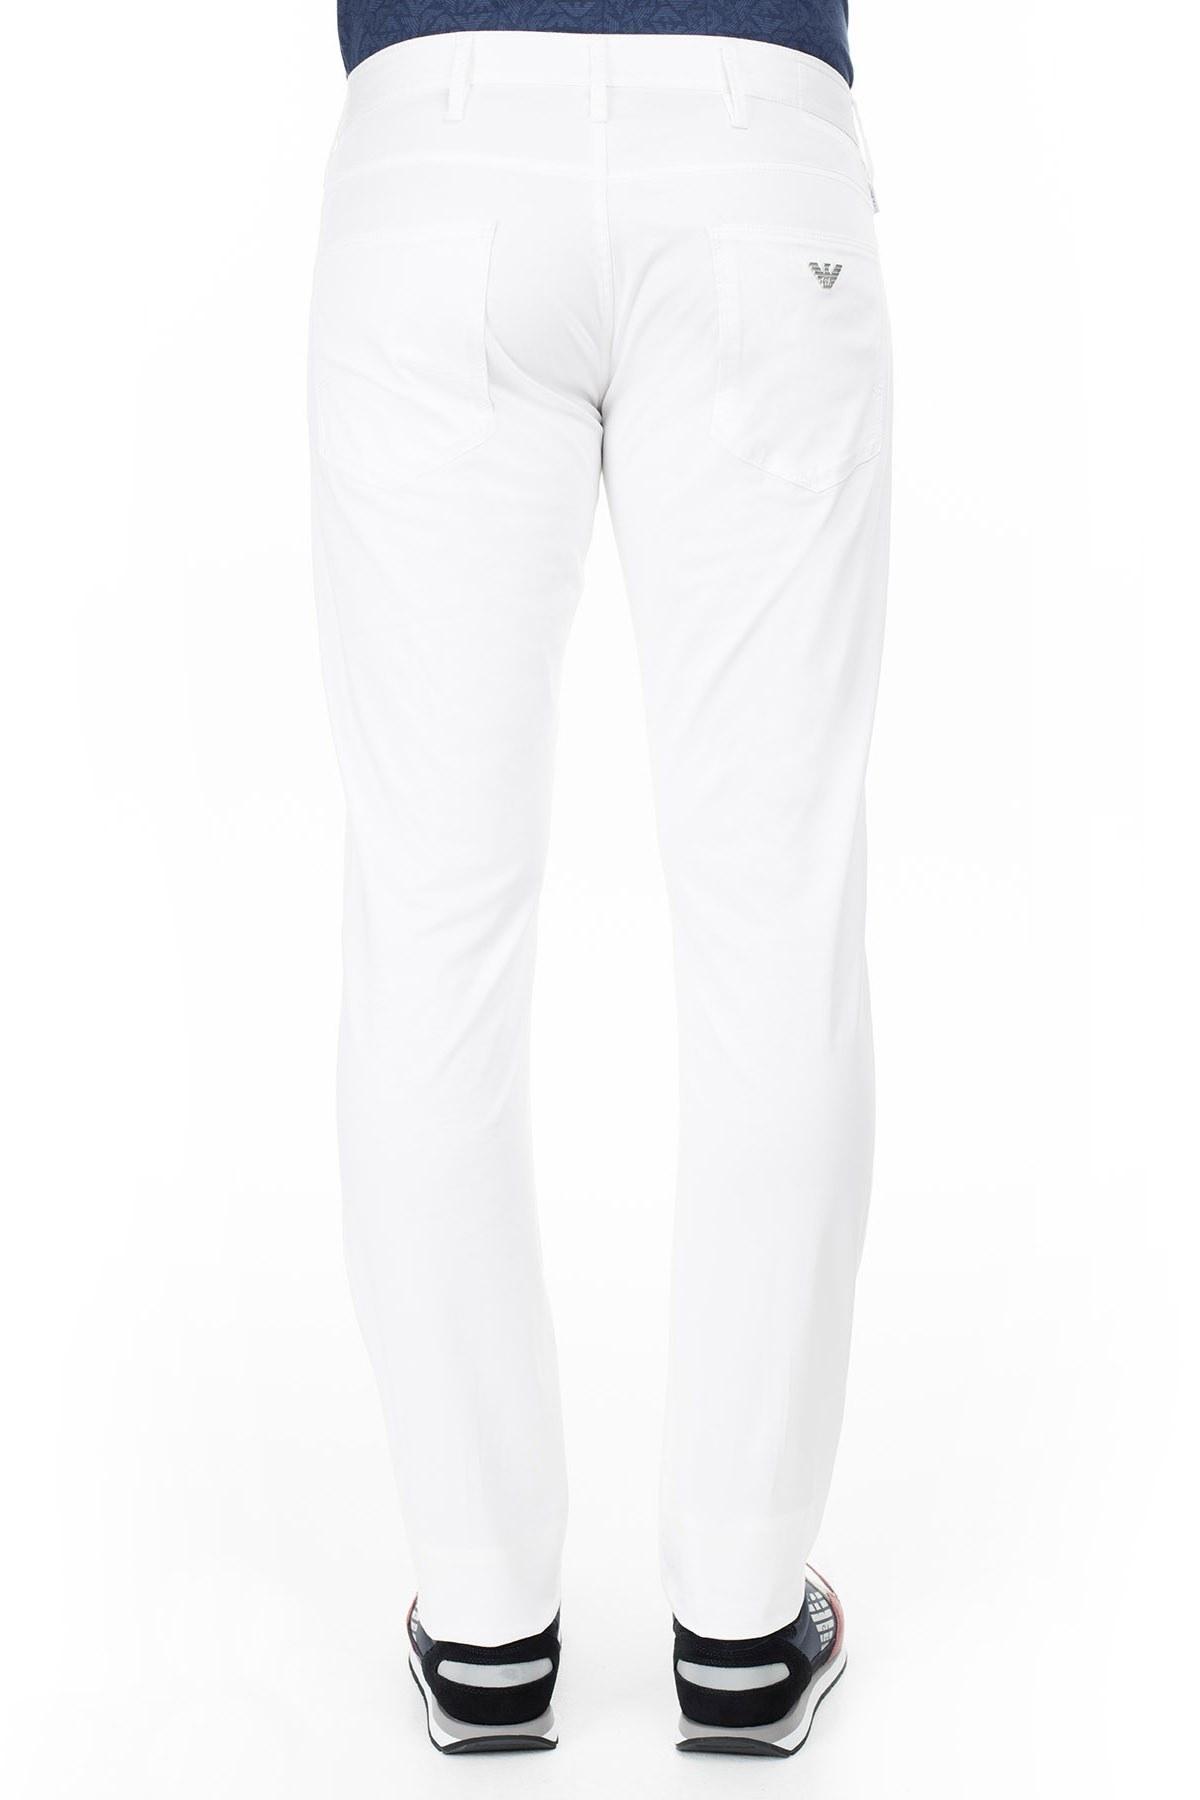 Armani J06 Jeans Erkek Pamuklu Pantolon 3Y6J06 6NEDZ 1100 BEYAZ